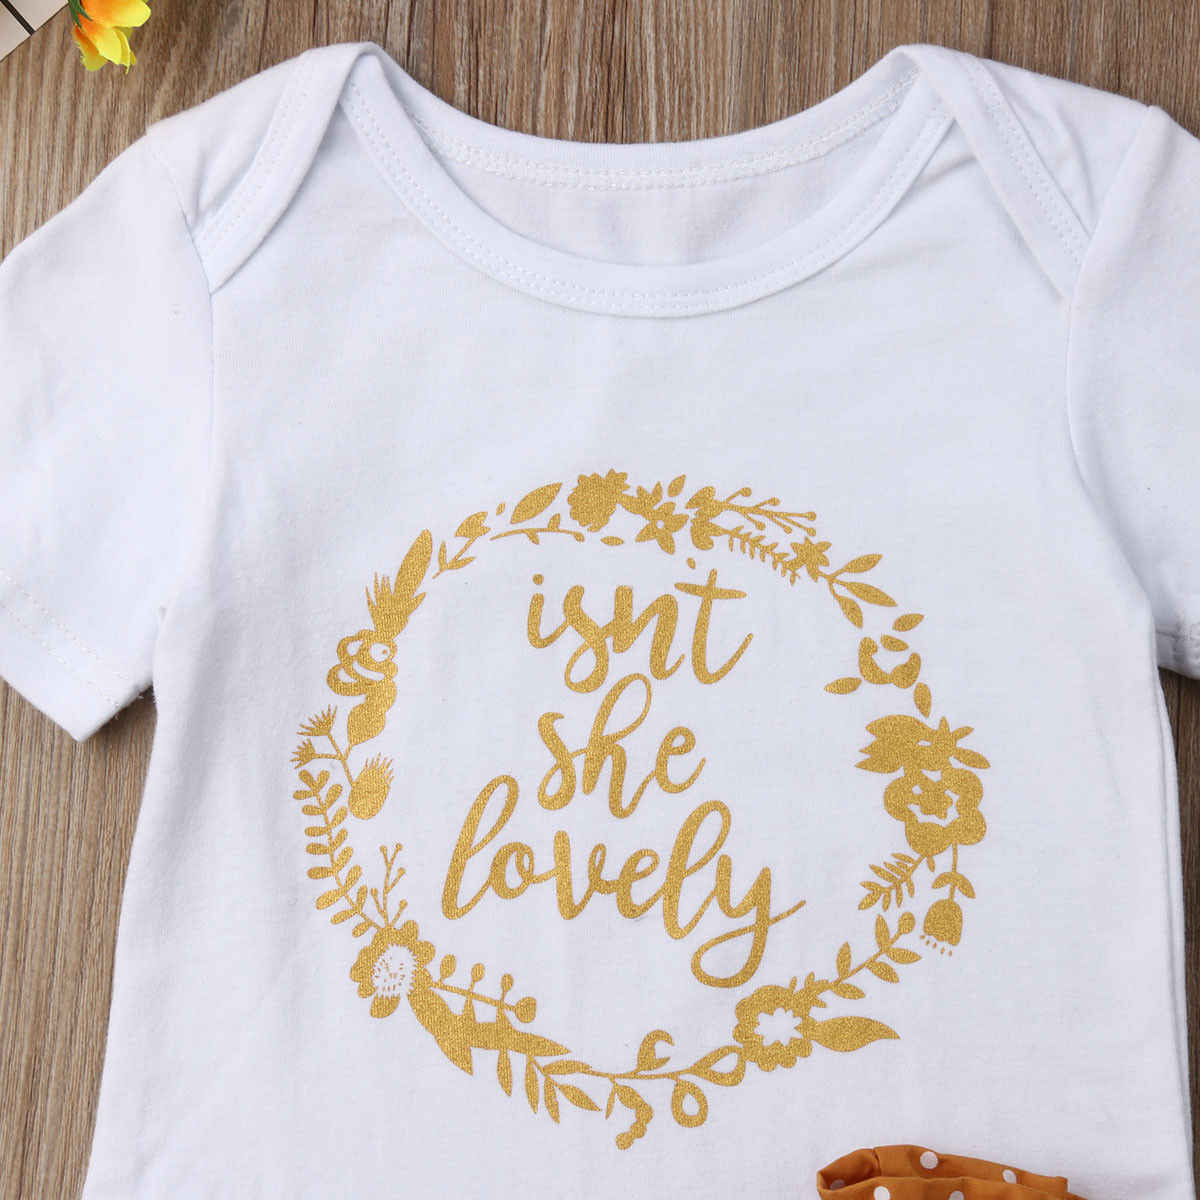 3 Pcs Neugeborenen Baby Mädchen Outfit Kleidung Tops Overall Bodysuit + Hosen Set